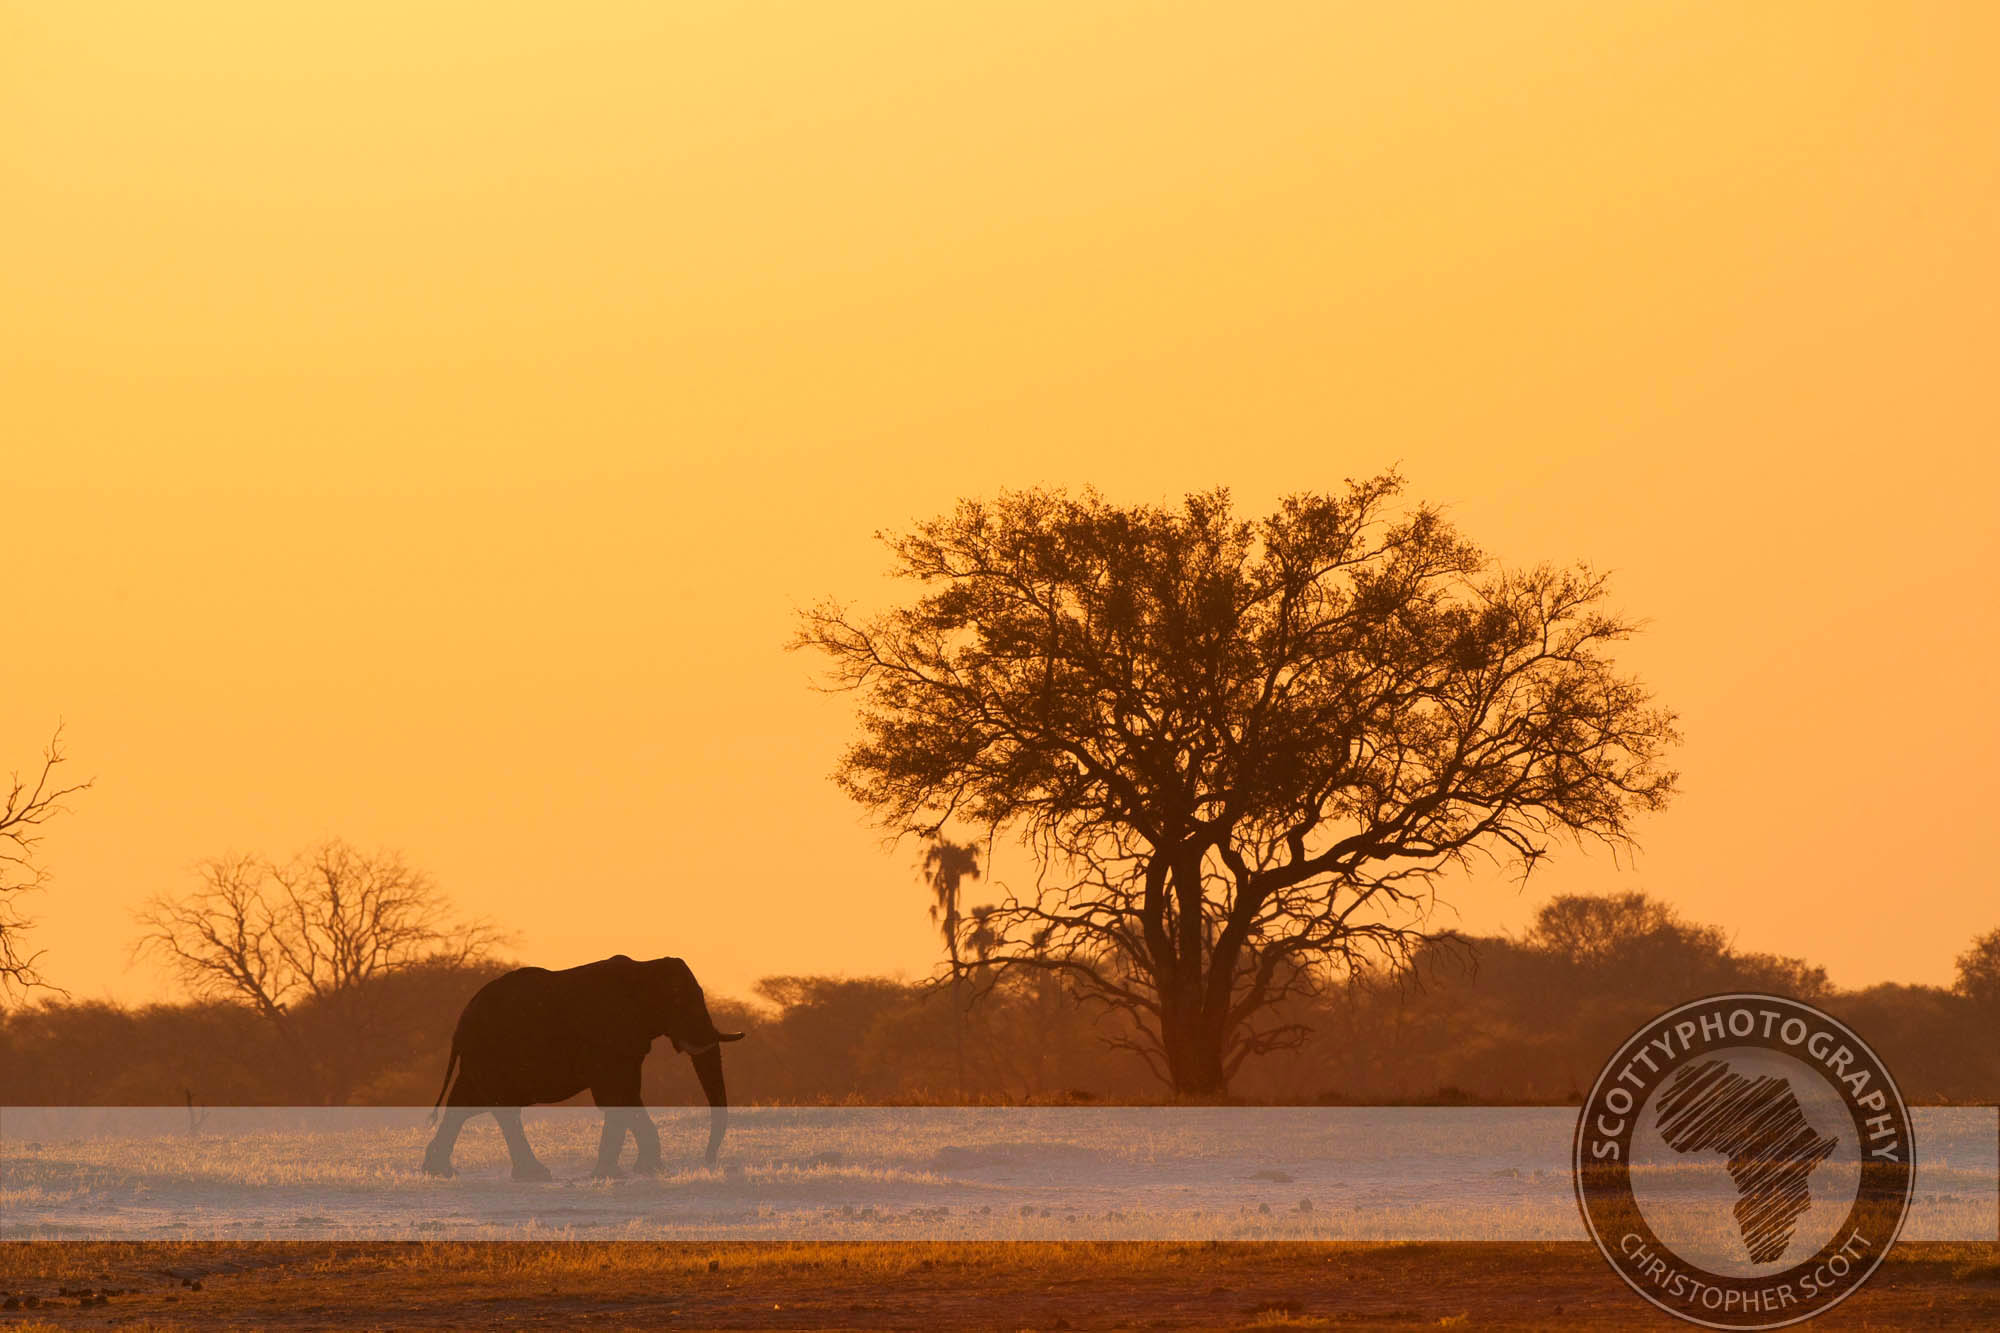 Elephant-4016-2 (1).jpg